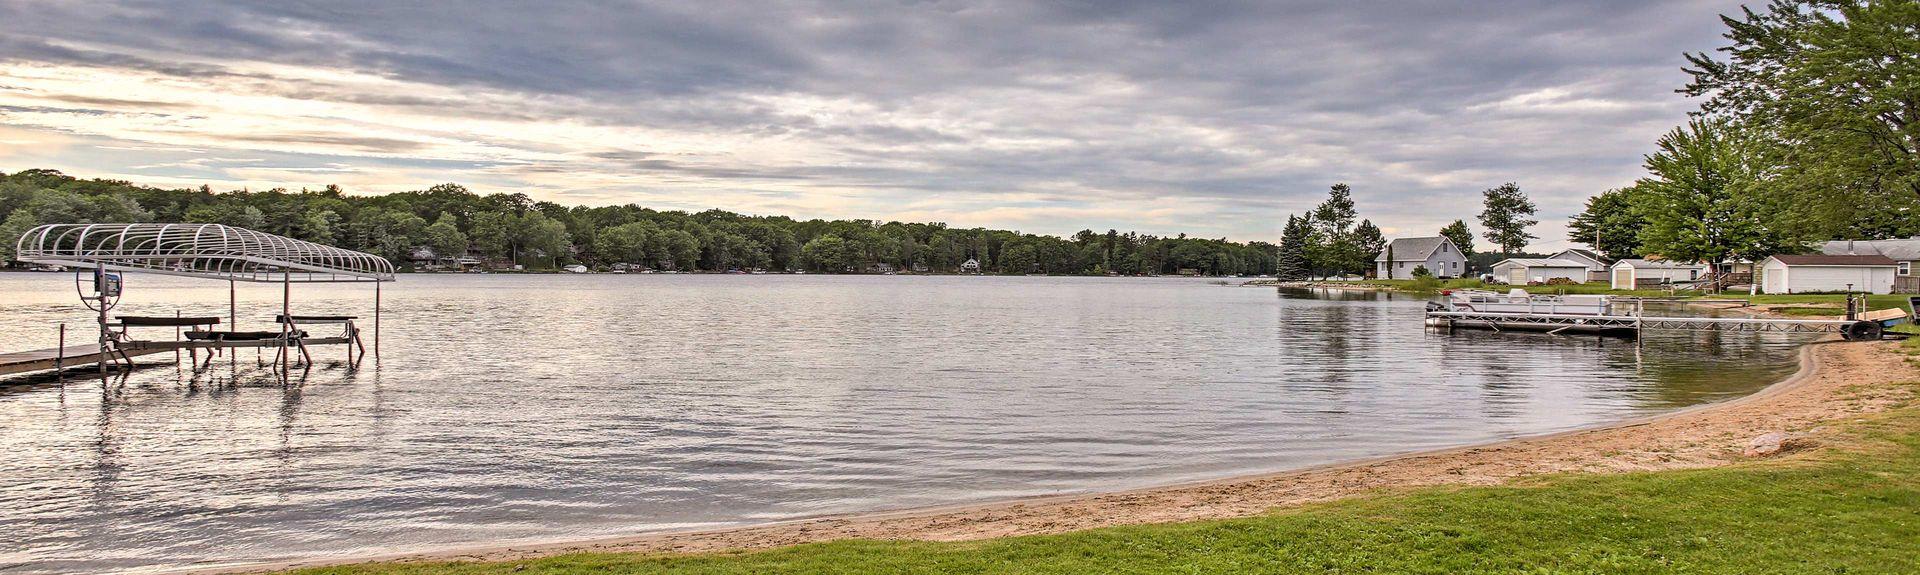 Marion, Osceola County, Michigan, Verenigde Staten